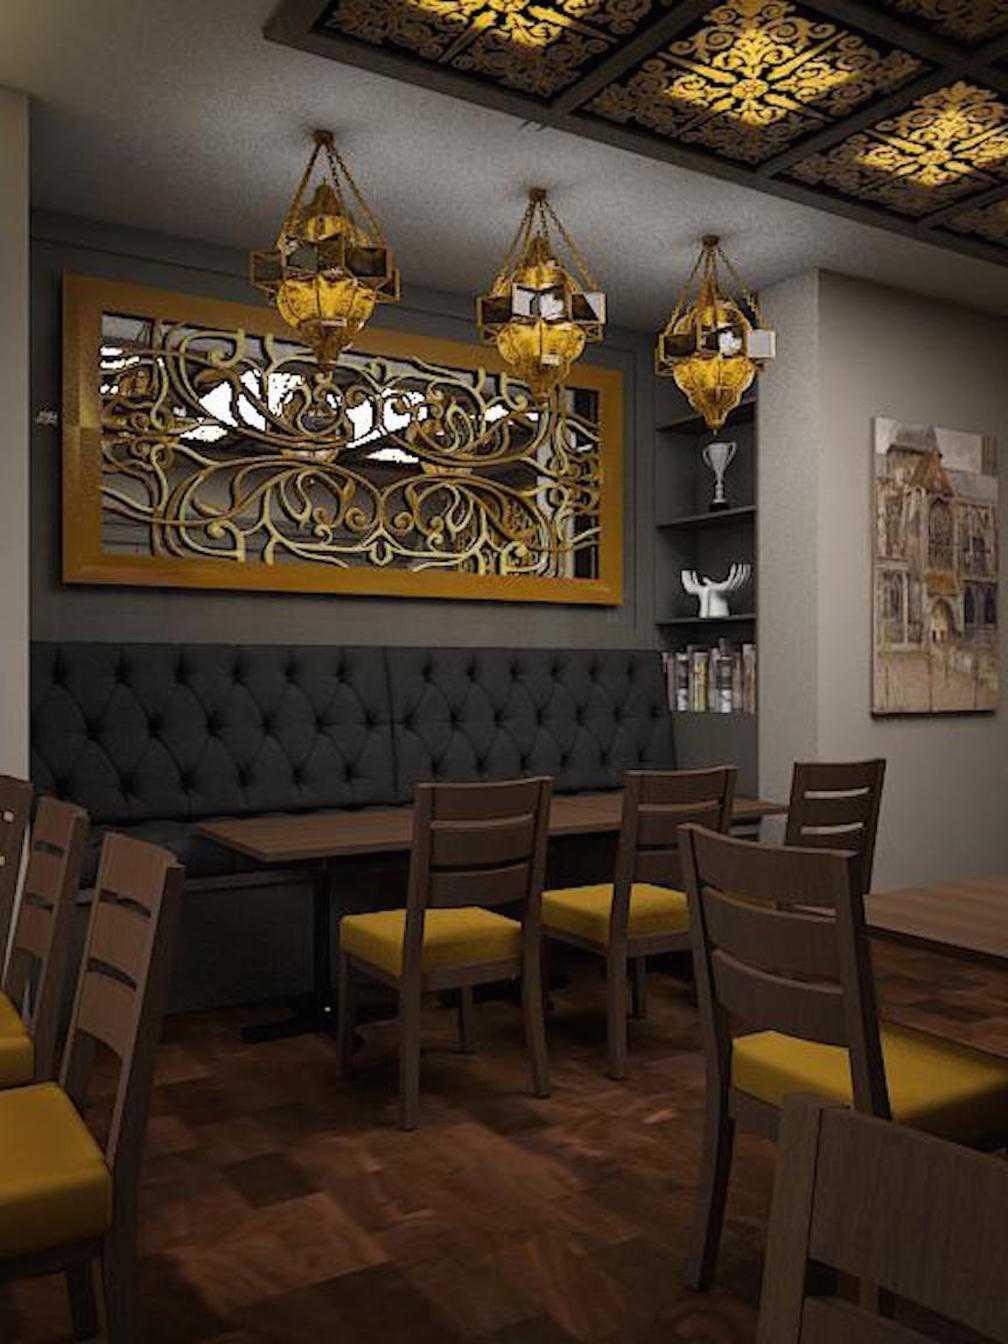 Expo Tje. Aa.aa.bsc.ba.ma Resto Cikajang - The Indonesian Javanese Minimalist Interior Design Jakarta Selatan Jakarta Selatan Resto-Cikajang Dining Room Tradisional Indonesian Javanese Minimalist Modern Interior Design Concept 26206